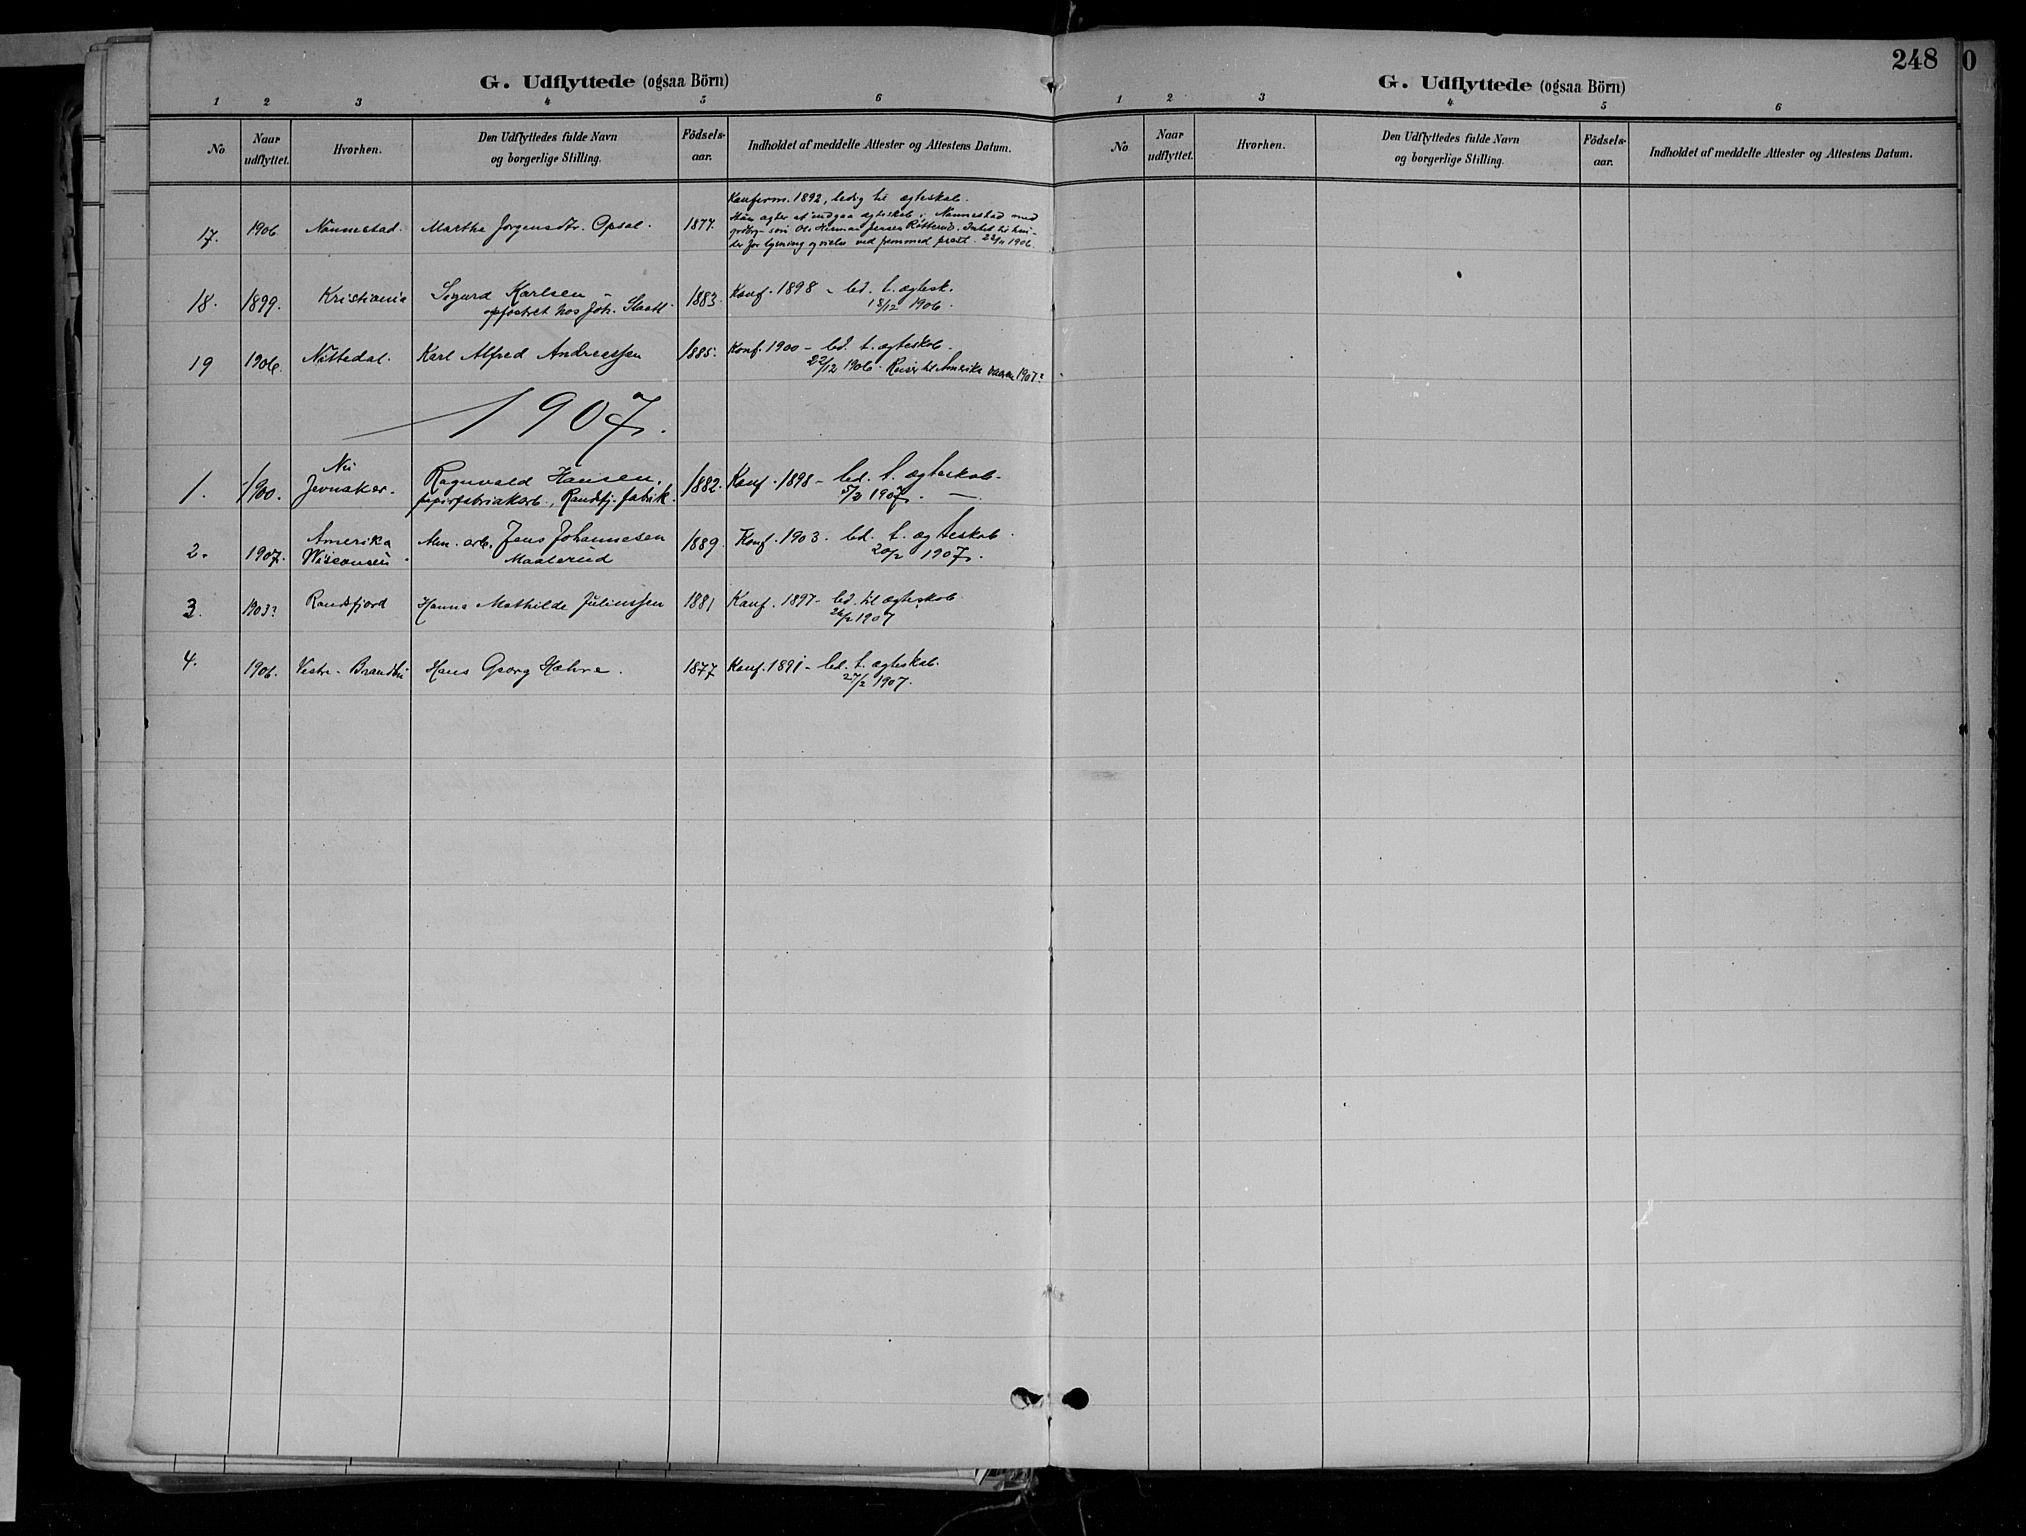 SAH, Jevnaker prestekontor, Ministerialbok nr. 10, 1891-1906, s. 248